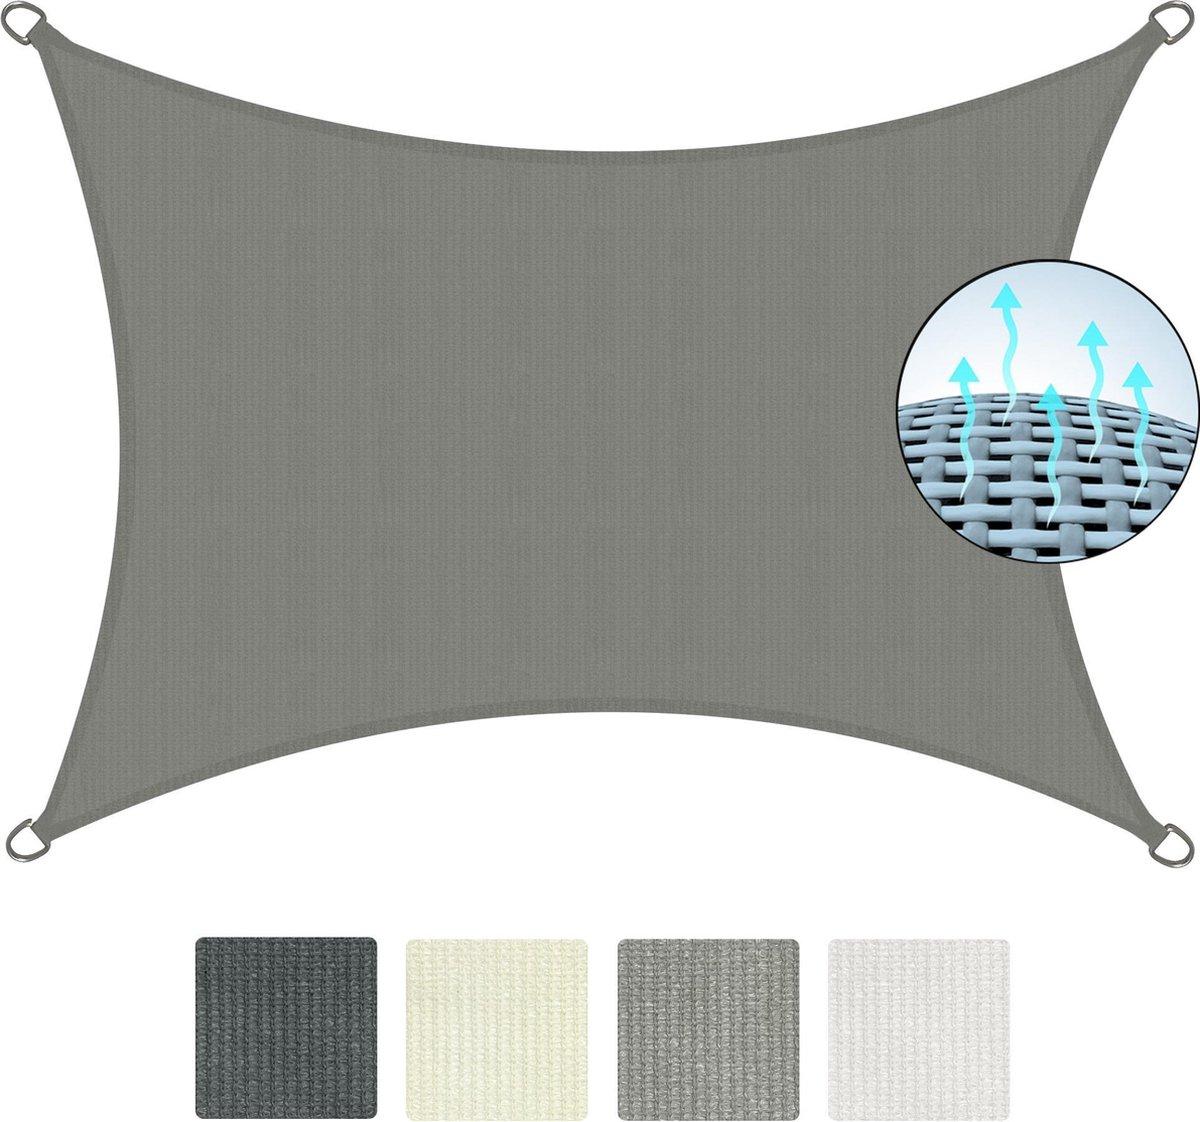 Sol Royal SolVision HS9 - Zonnezeil rechthoekig 200x400 cm HDPE Ademend - Grijs - Zonwering UV-besch